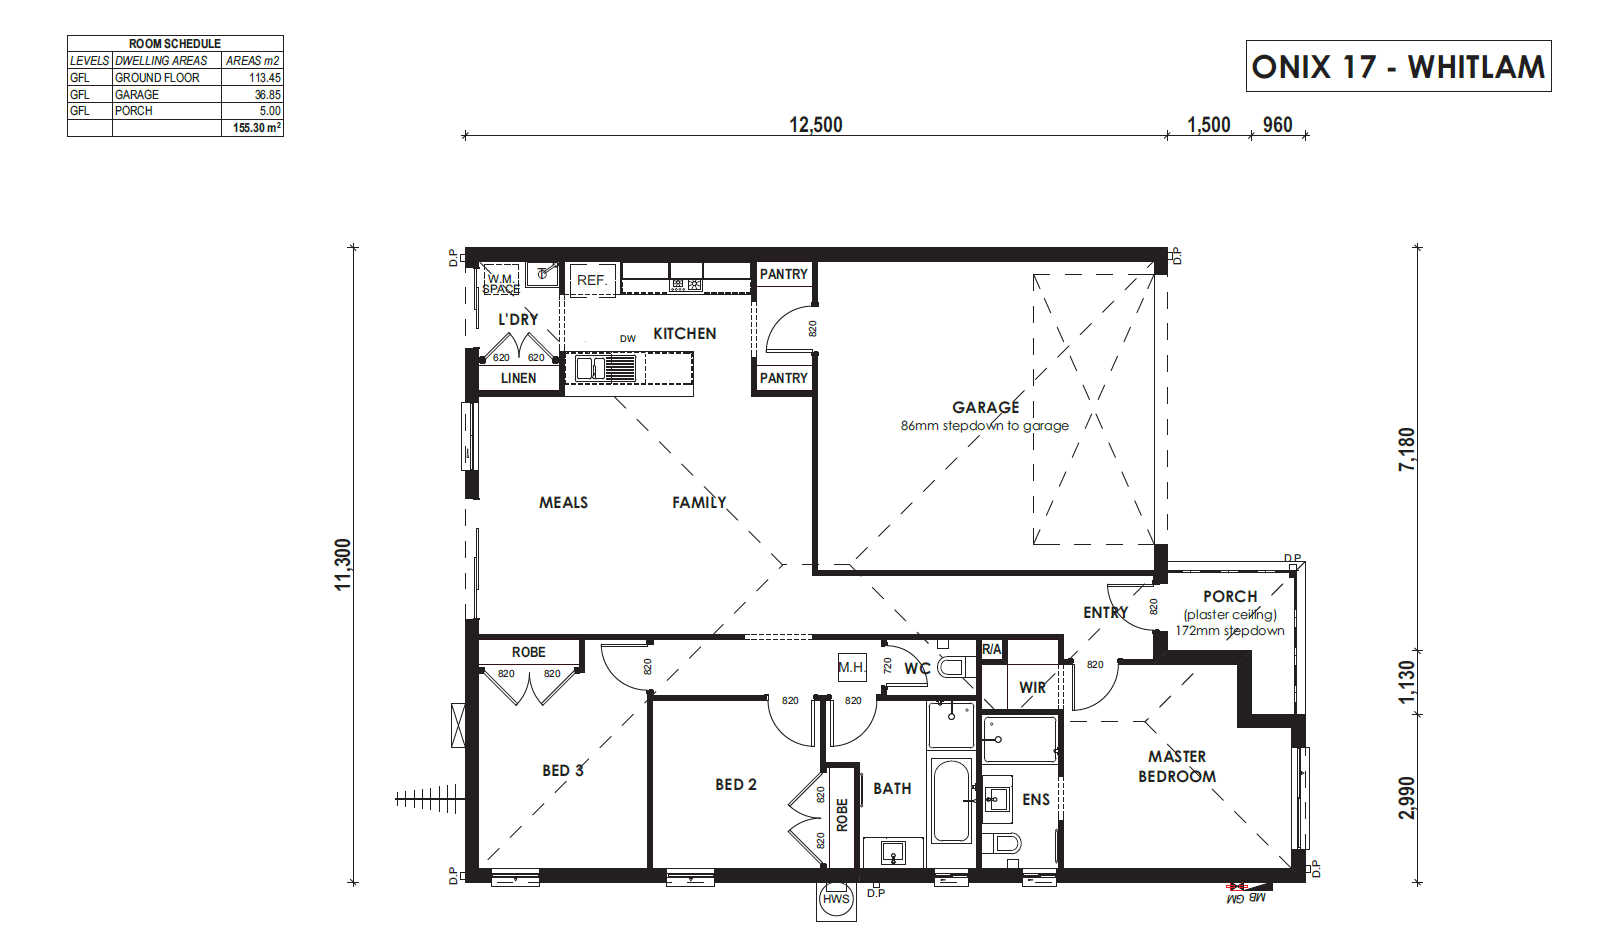 Lot 818 - Mambourin - Onix 17_Whitlam